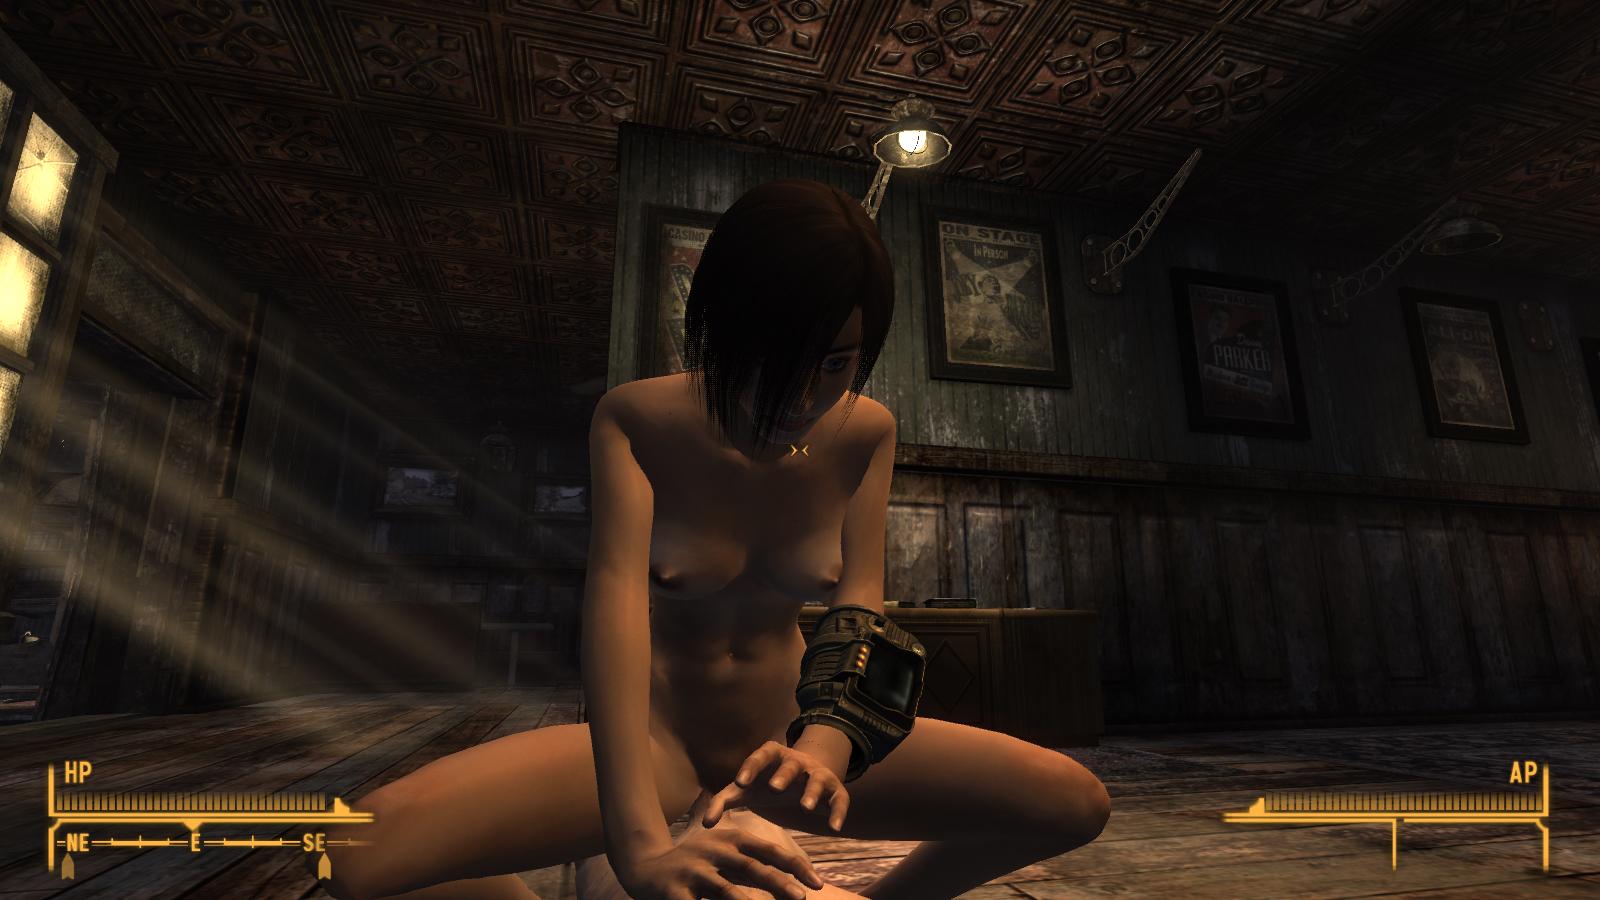 Fallout 3 angel mod porn nackt photos